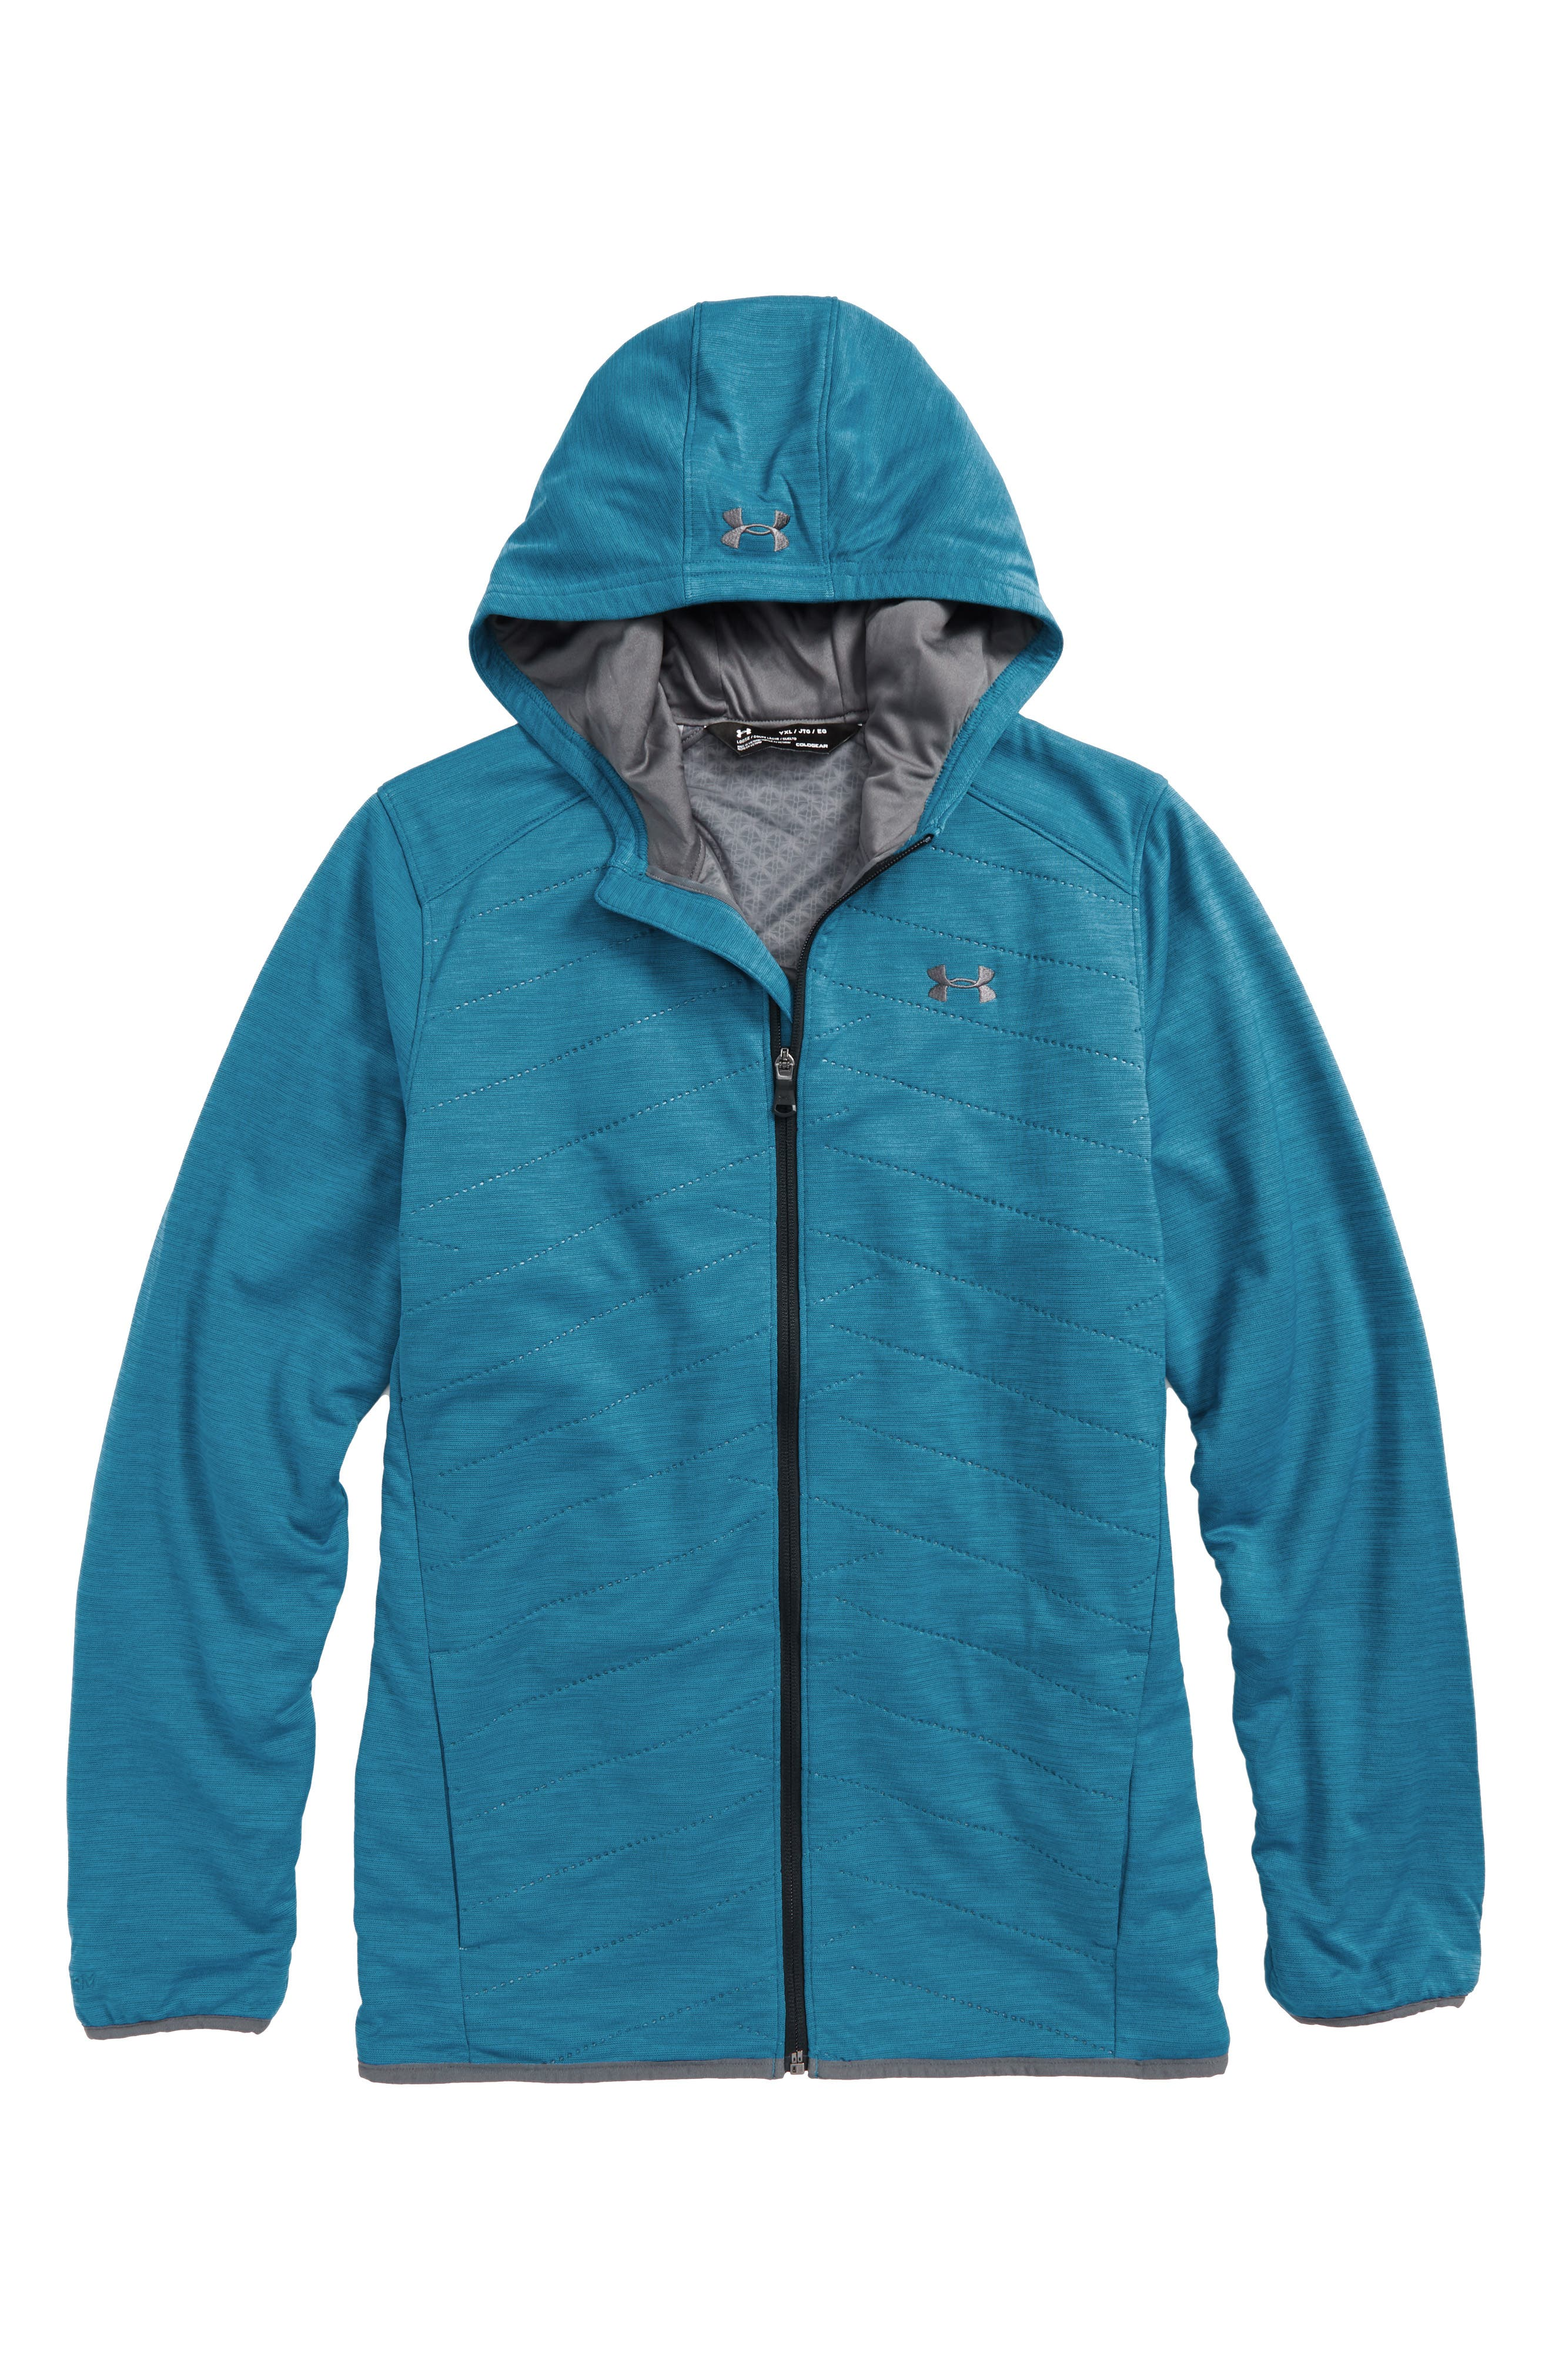 ColdGear<sup>®</sup> Reactor Hybrid Hooded Jacket,                             Main thumbnail 1, color,                             Bayou Blue/ Rhino Gray